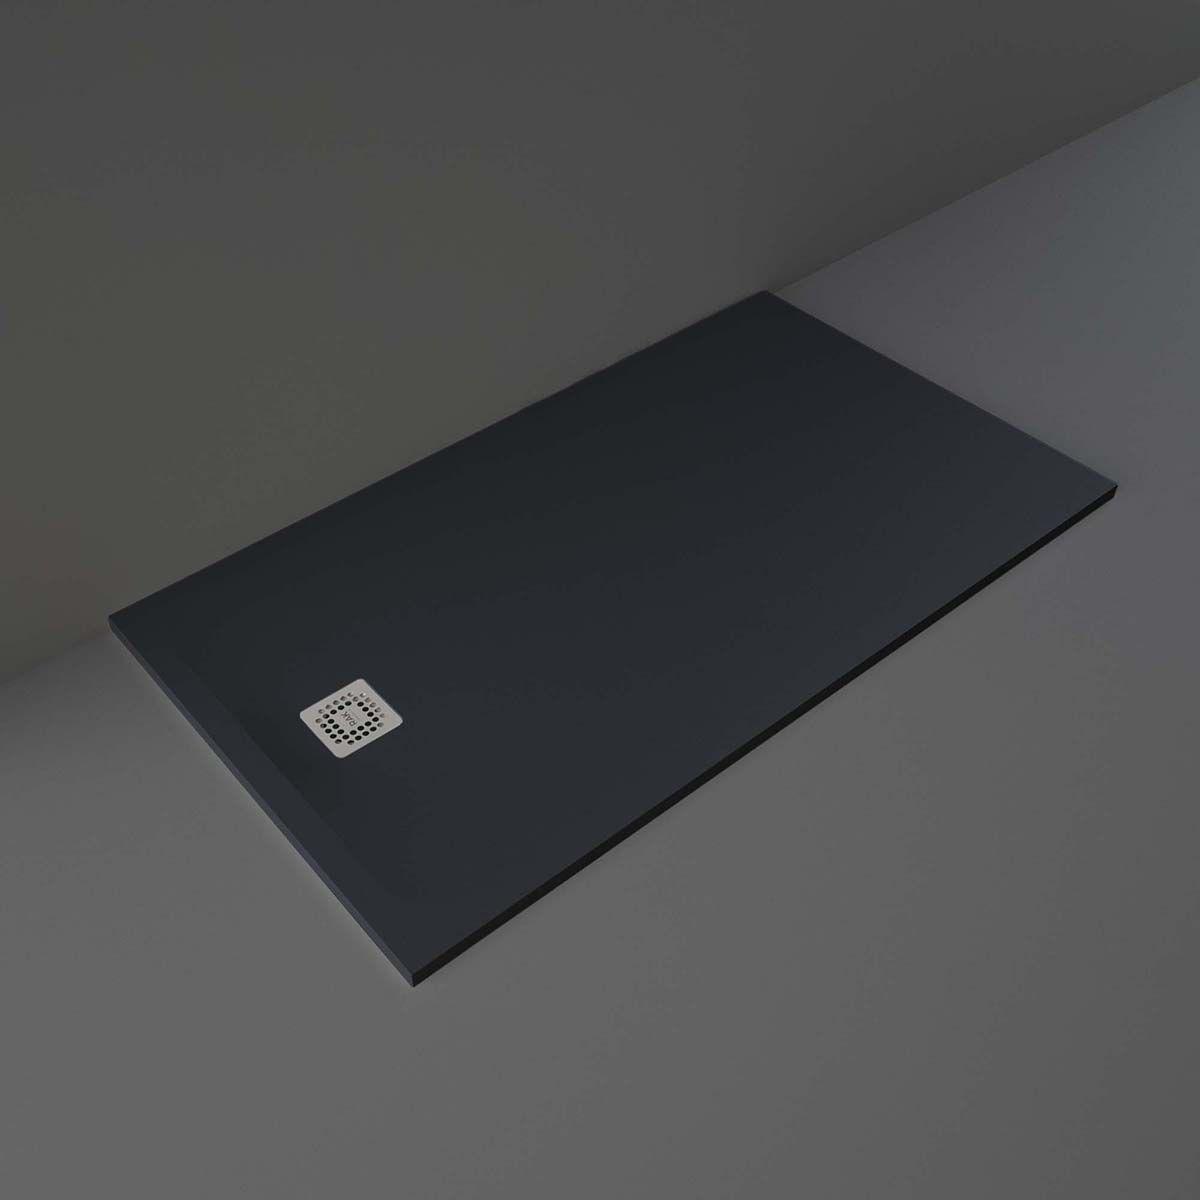 RAK Feeling Black Rectangular Shower Tray 1600 x 900mm